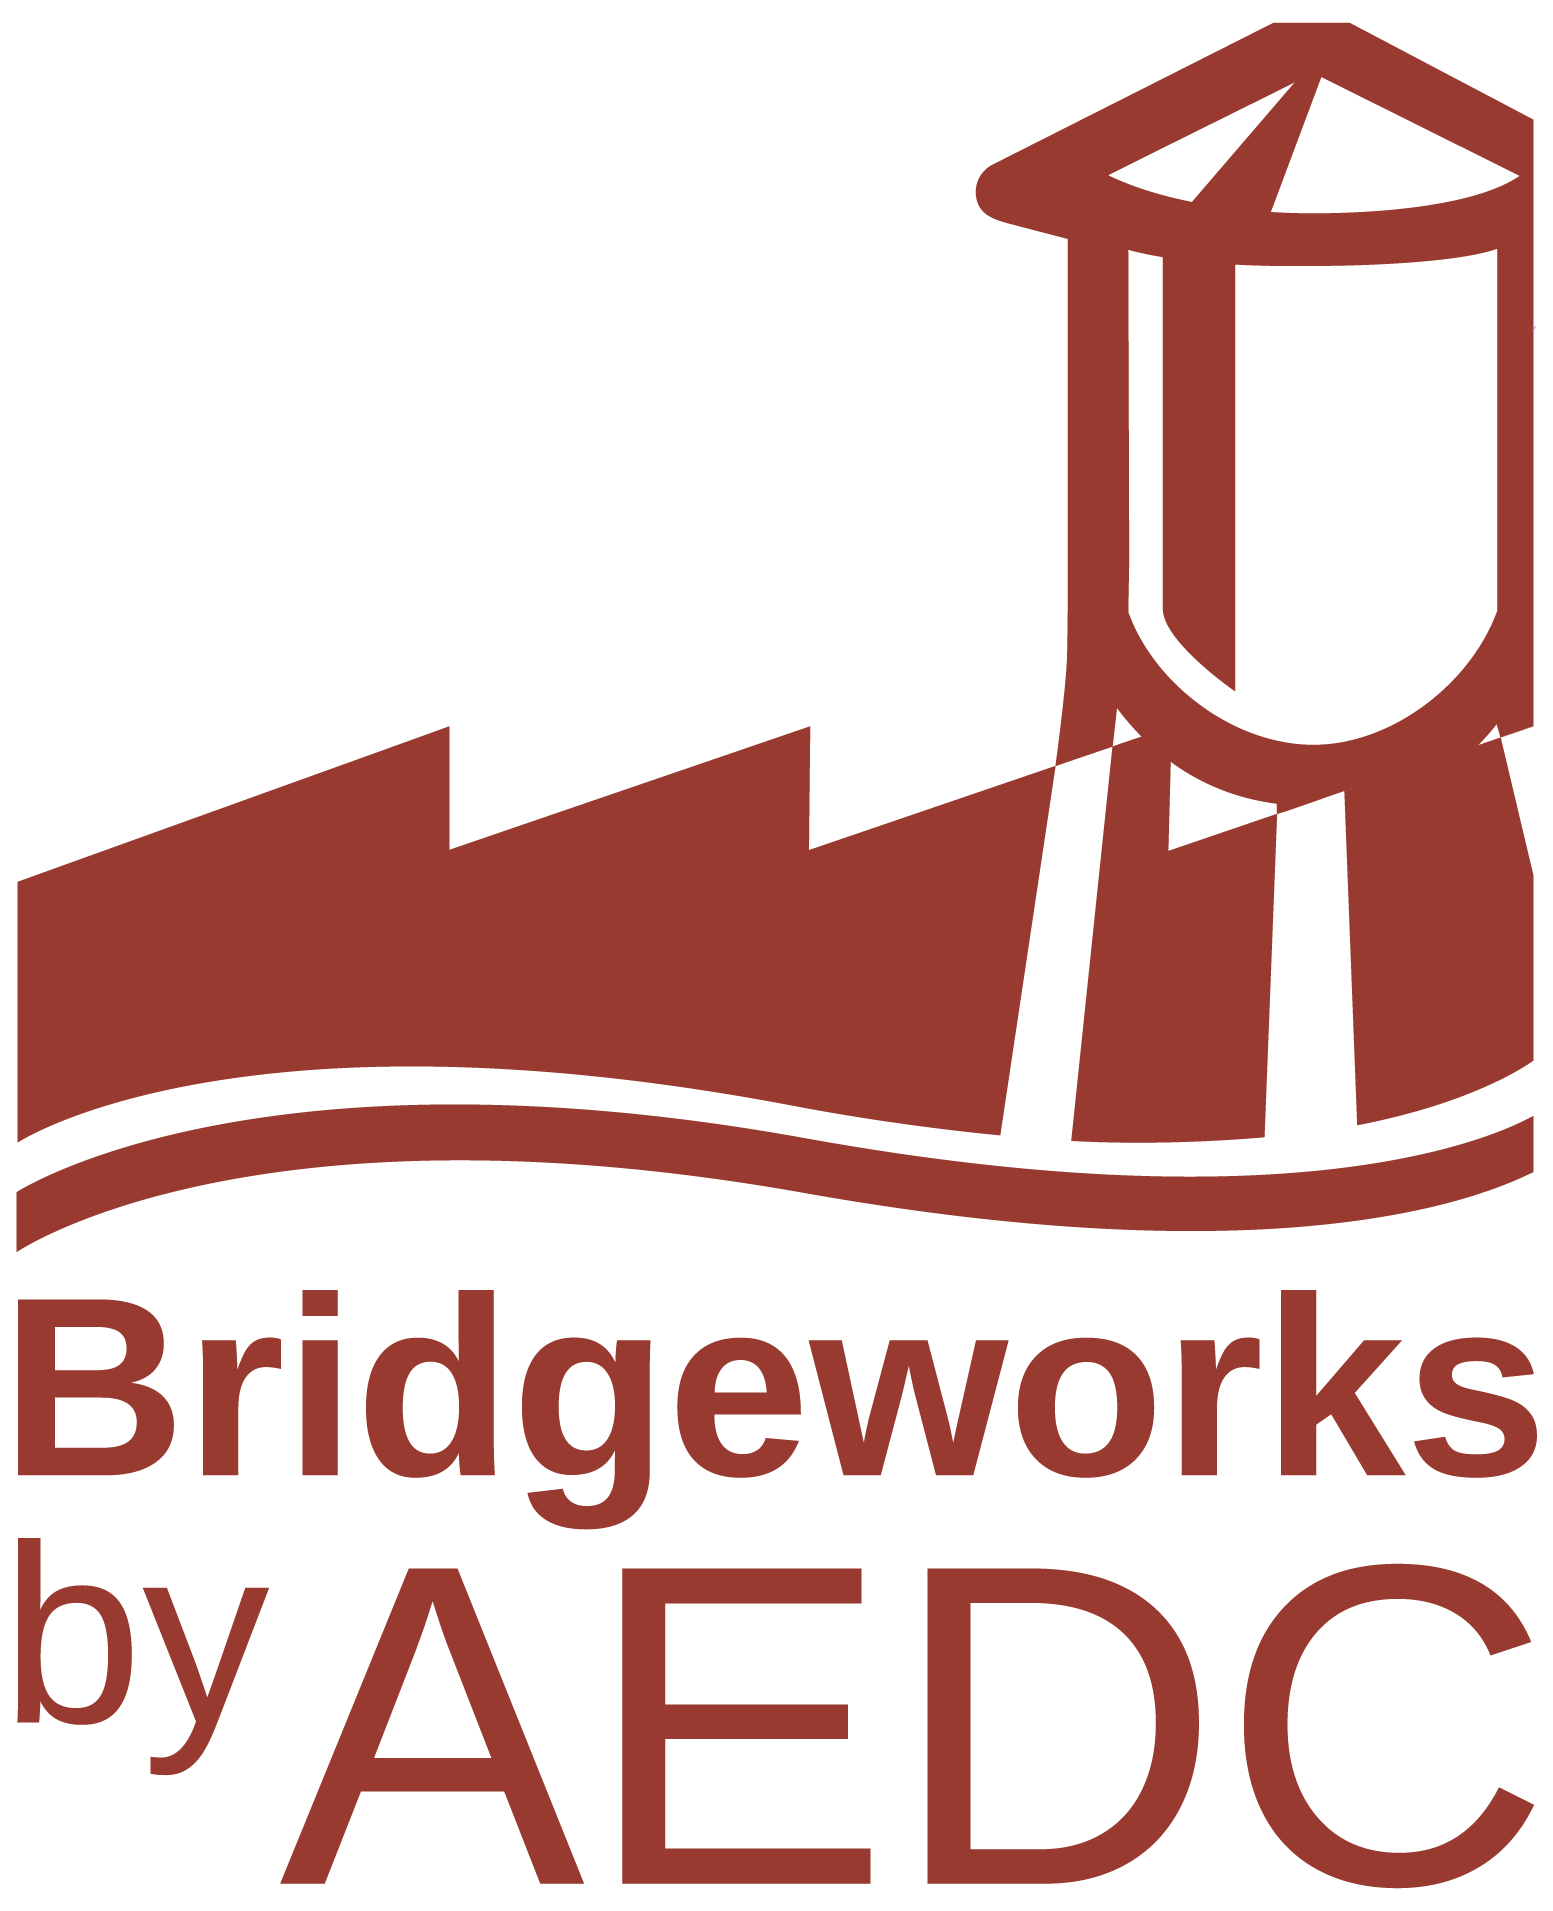 AEDC Division Logos_Bridgeworks Red.png